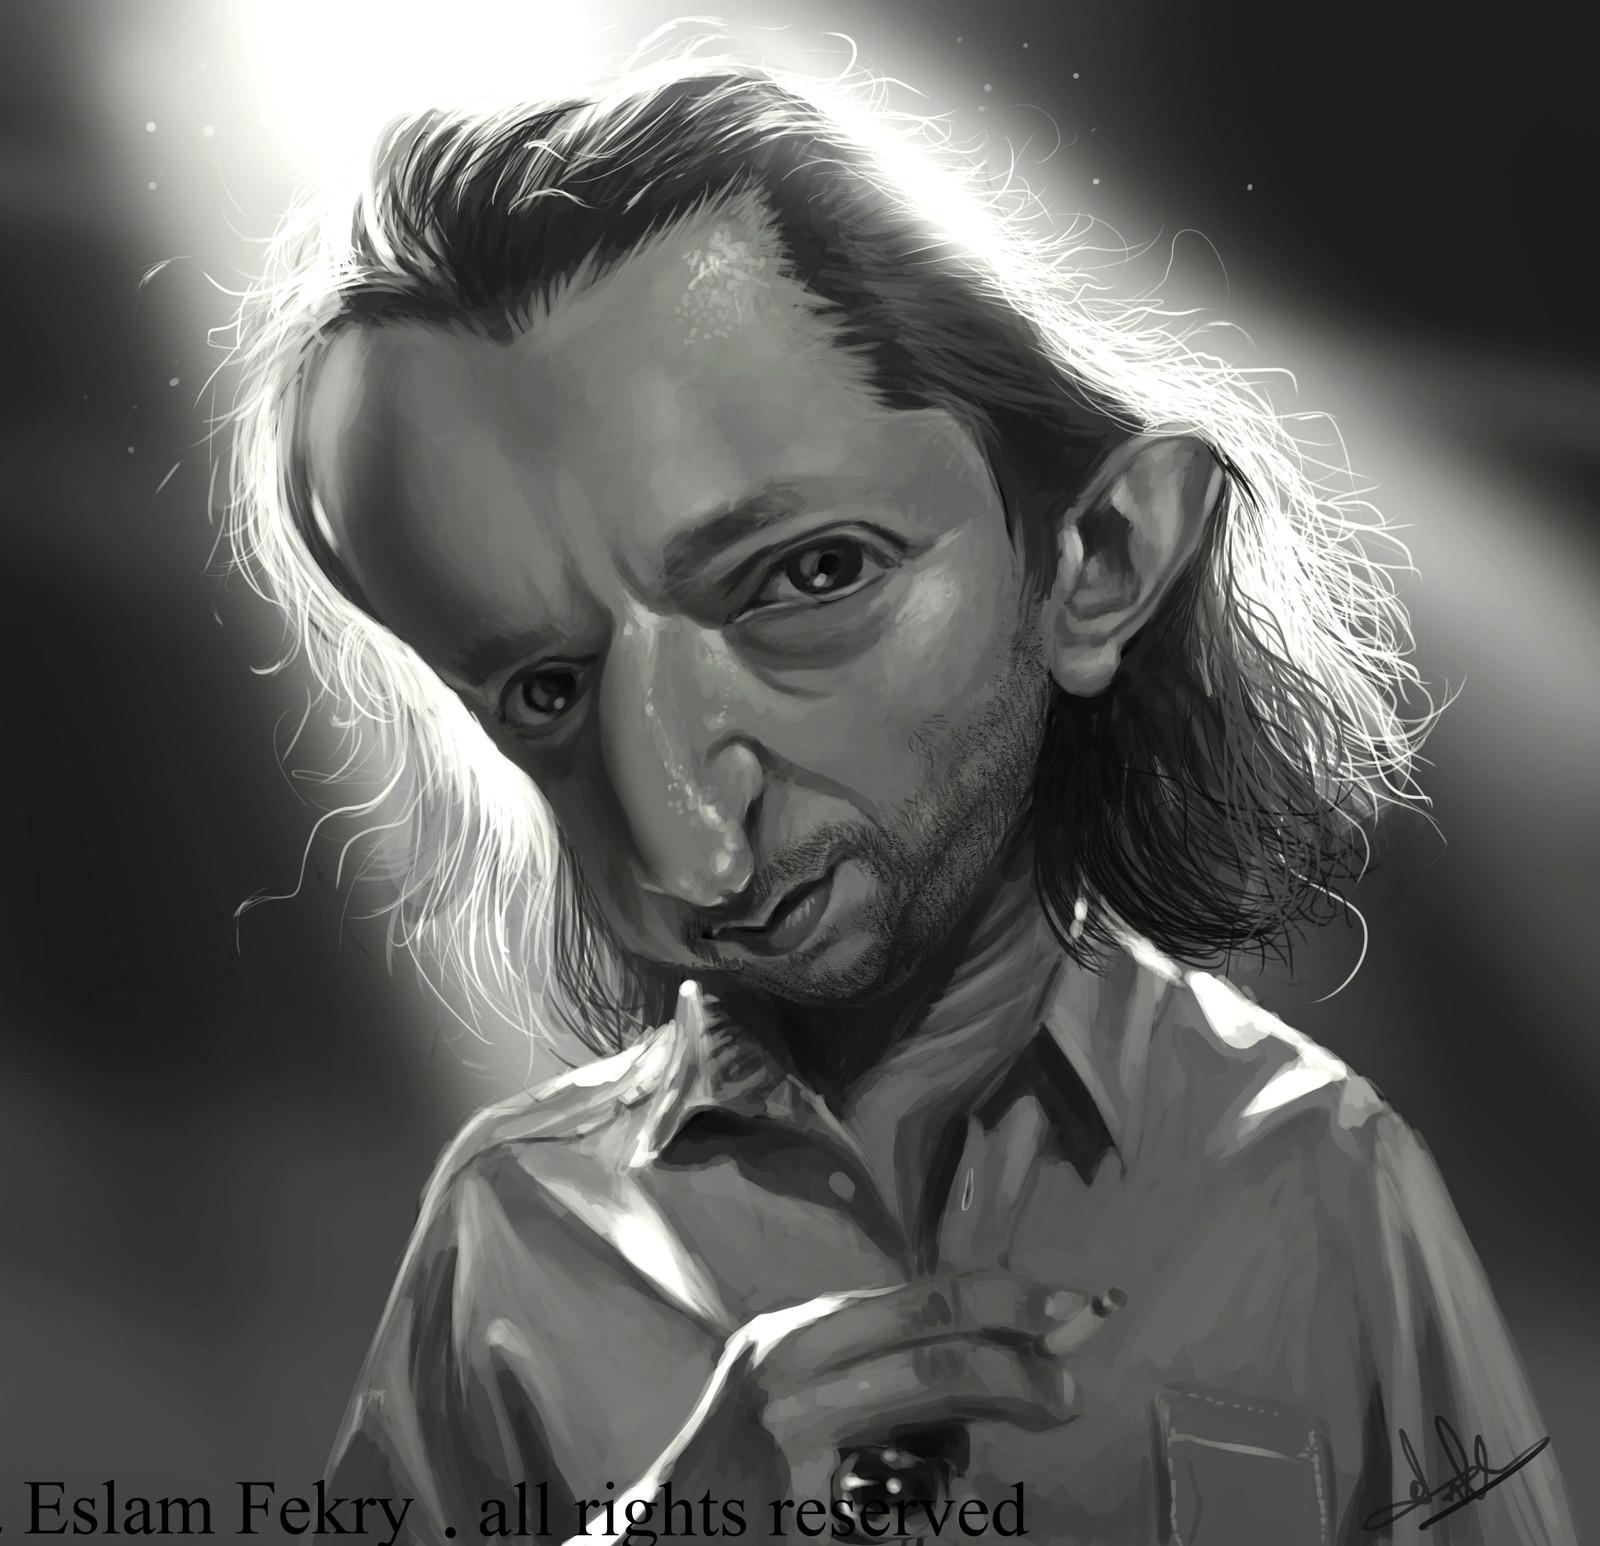 Mr abu khamra